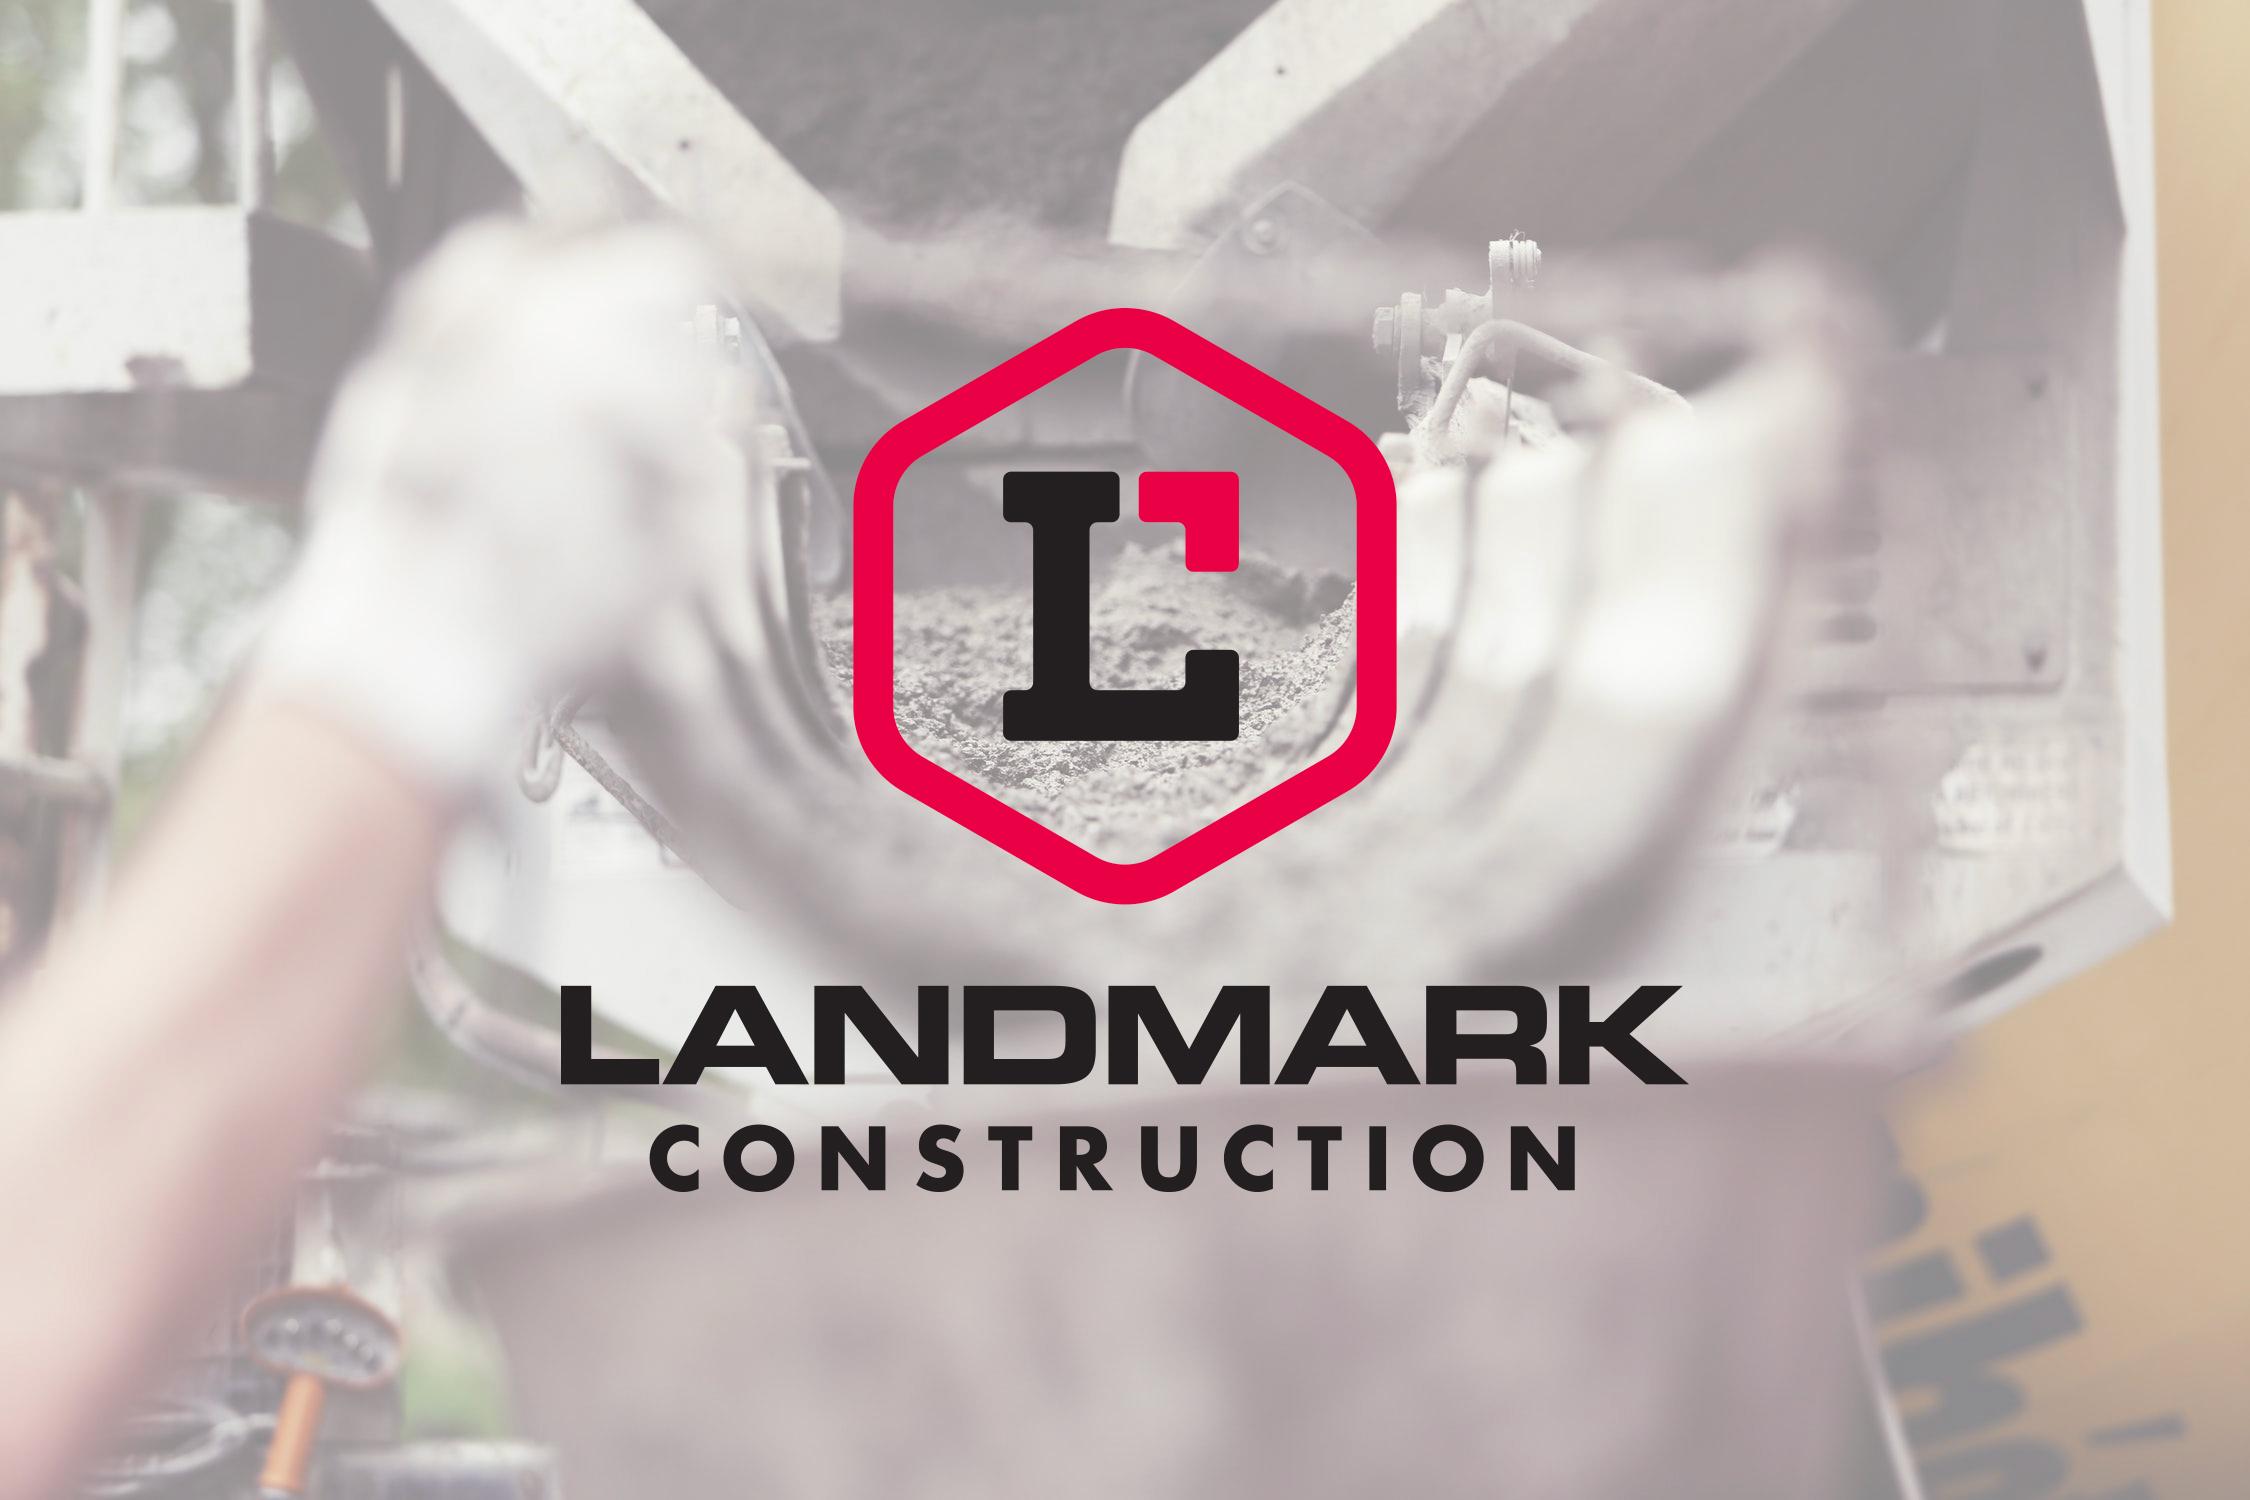 landmark_011.jpg